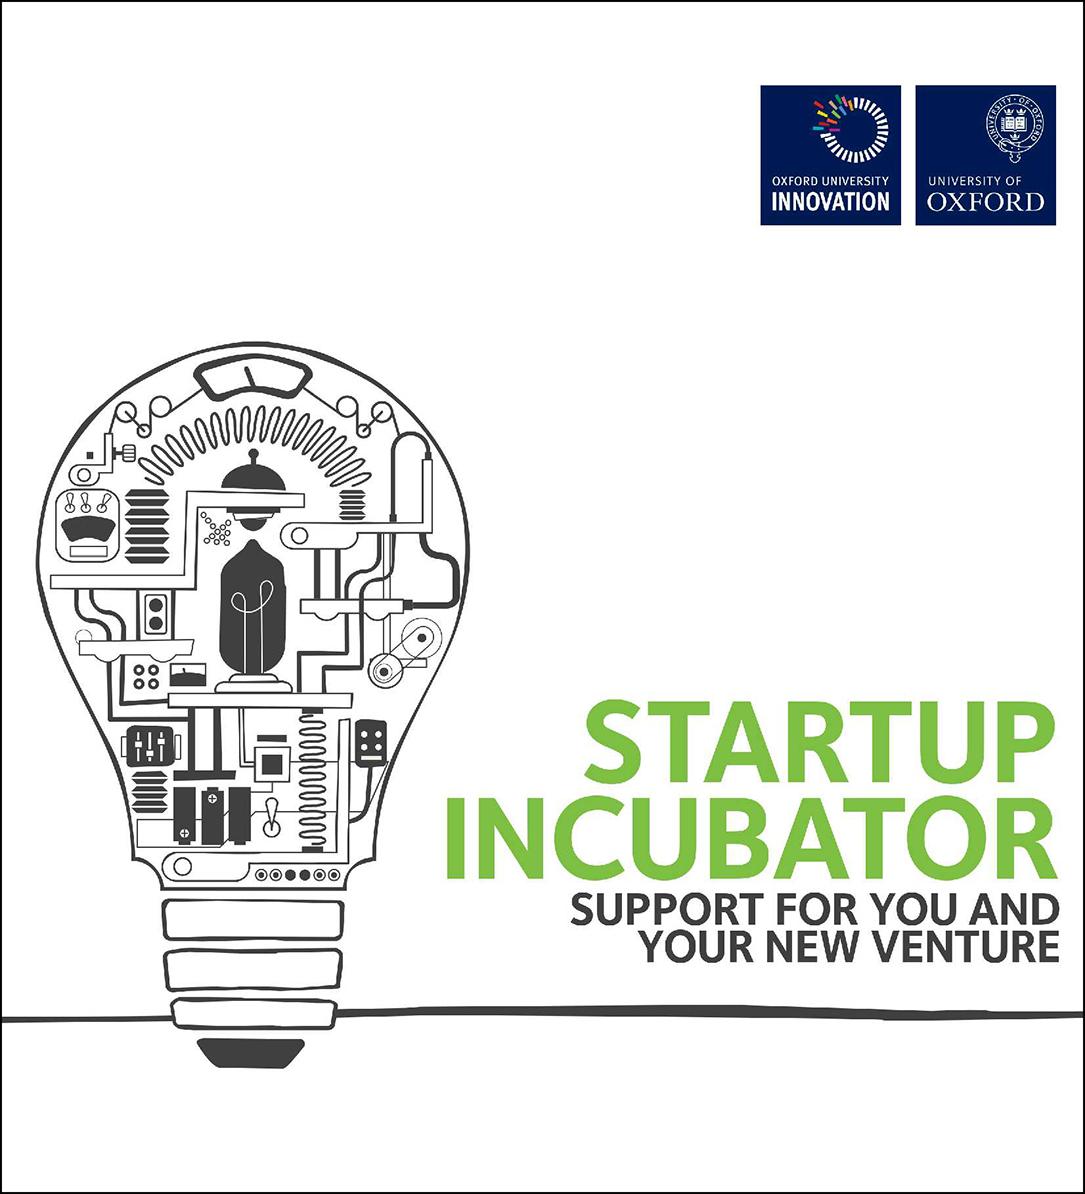 Start Up Inkubator